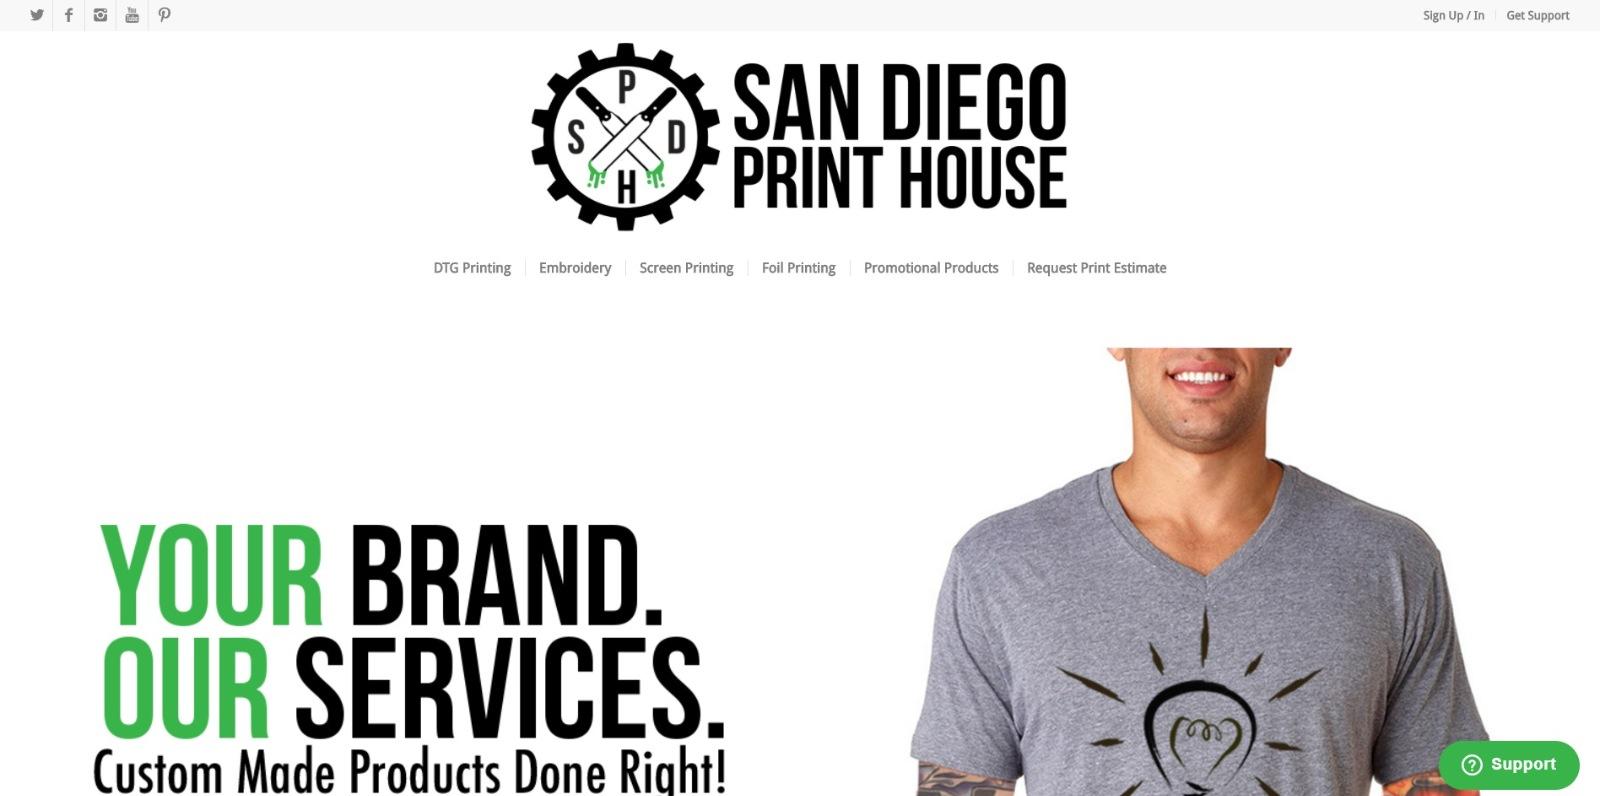 San Diego Print House